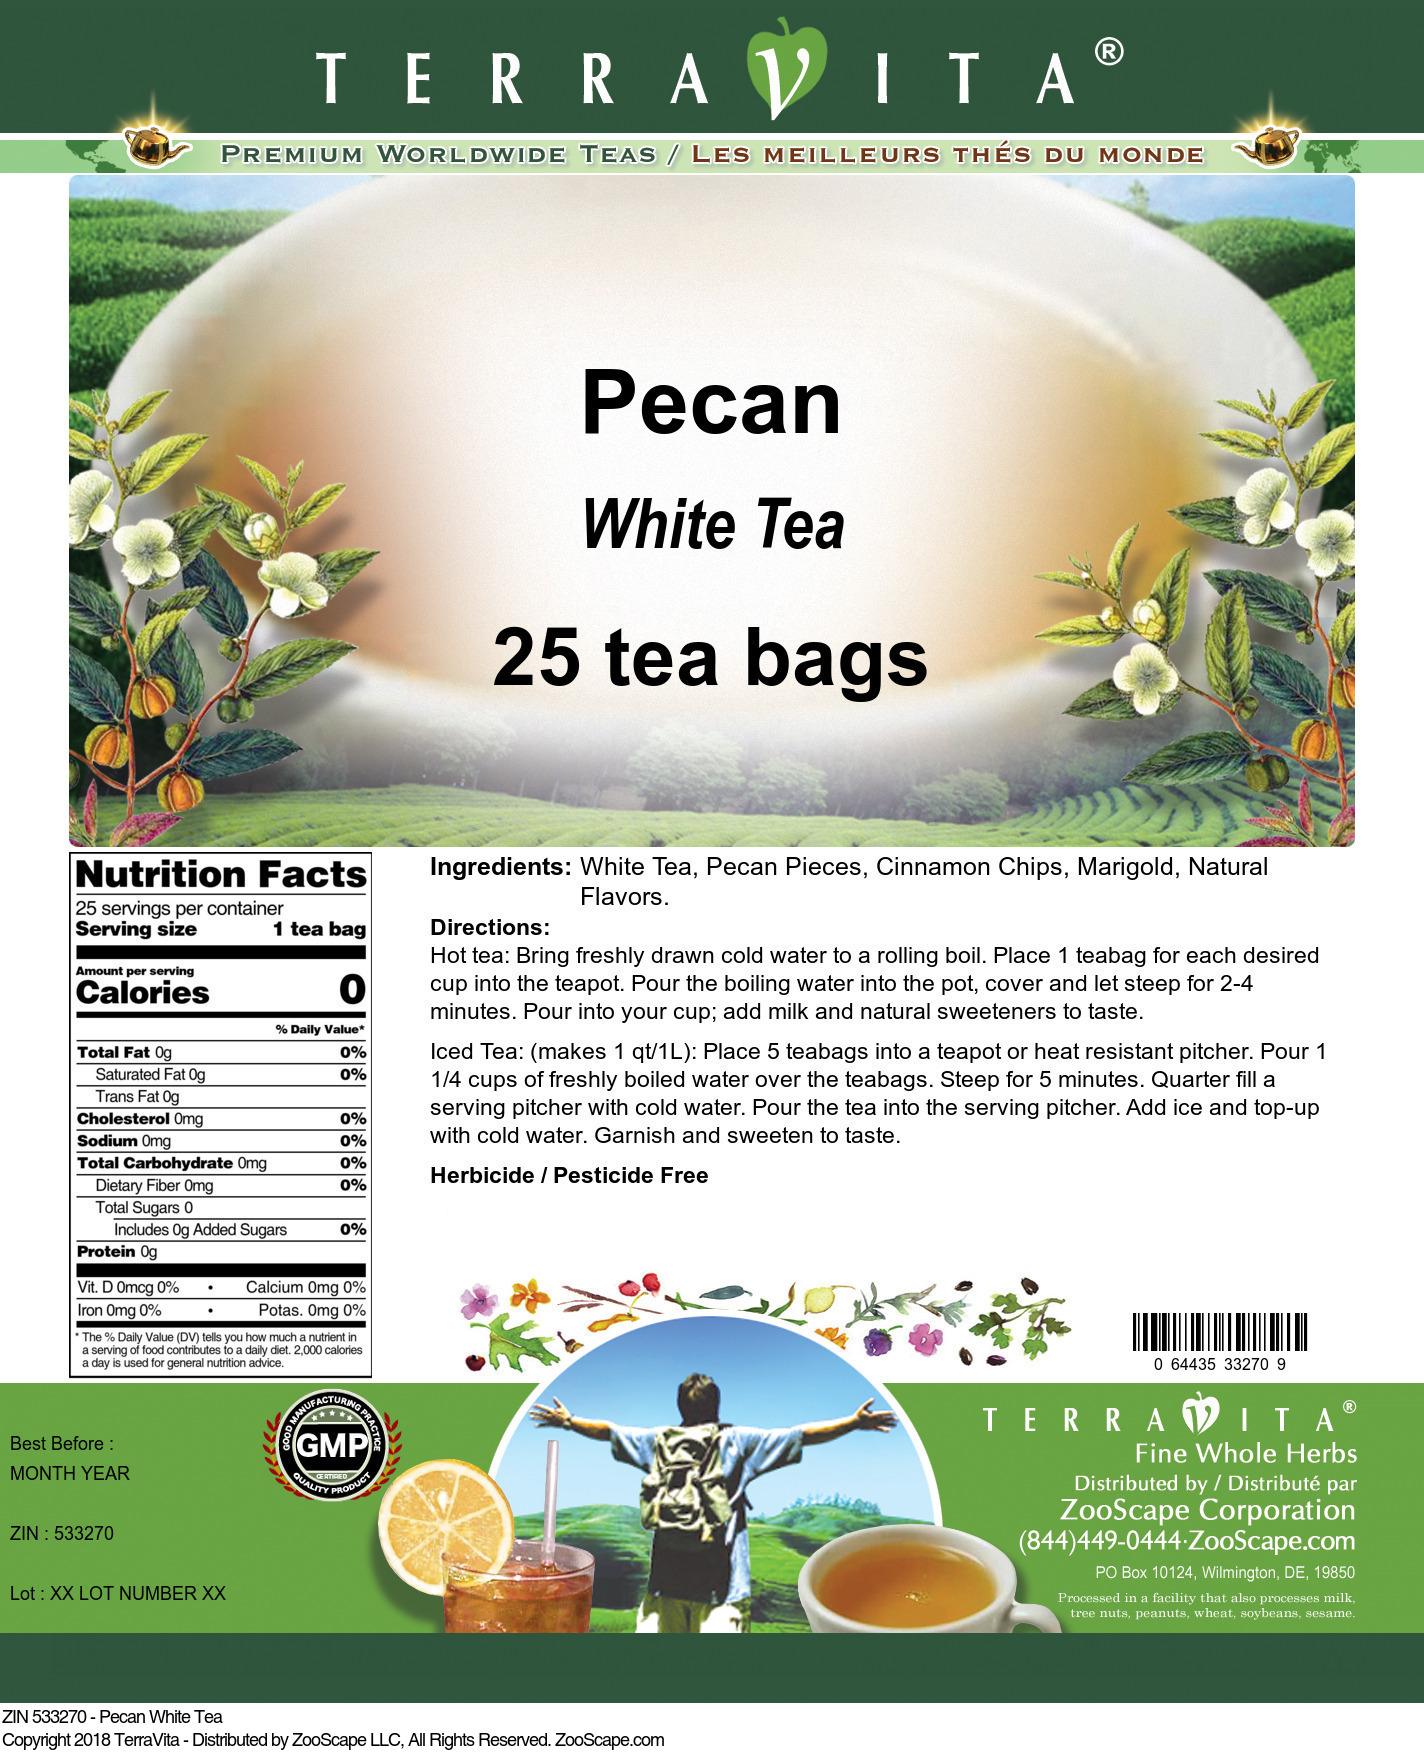 Pecan White Tea